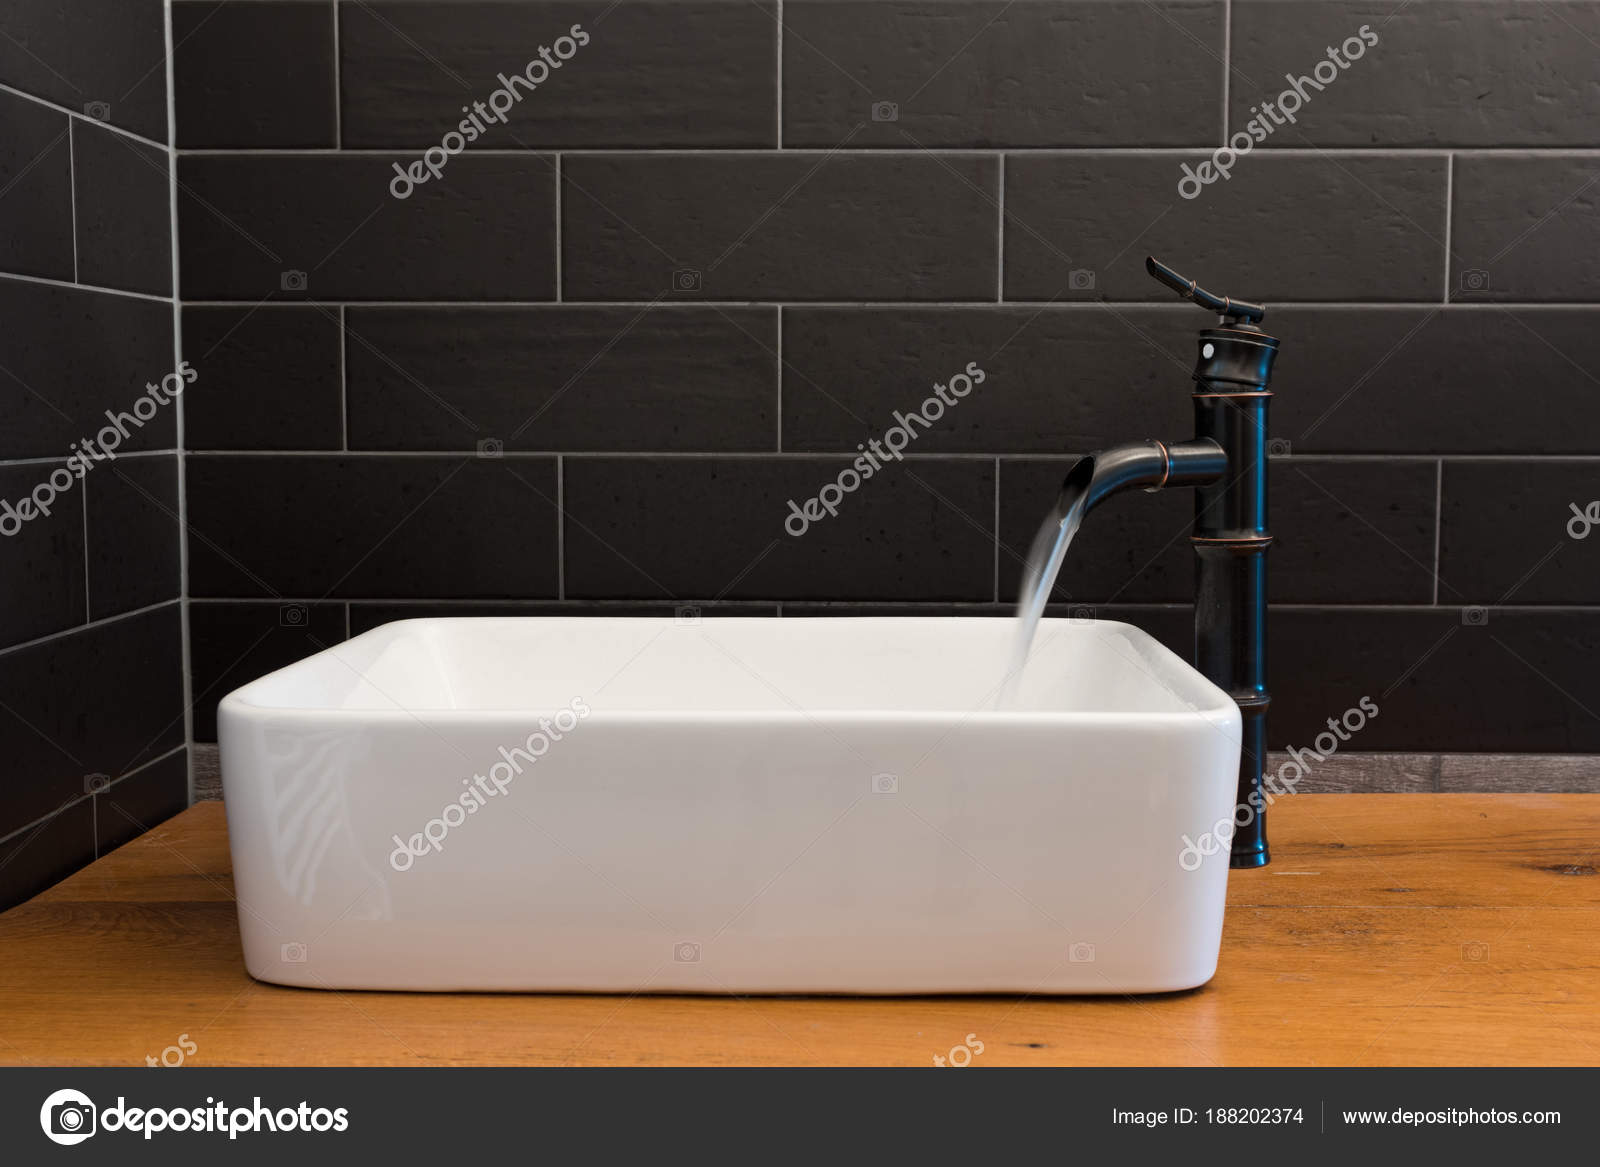 Modern Wit Vierkant Wastafel Badkamer Met Zwarte Tegels Zwarte Kraan ...